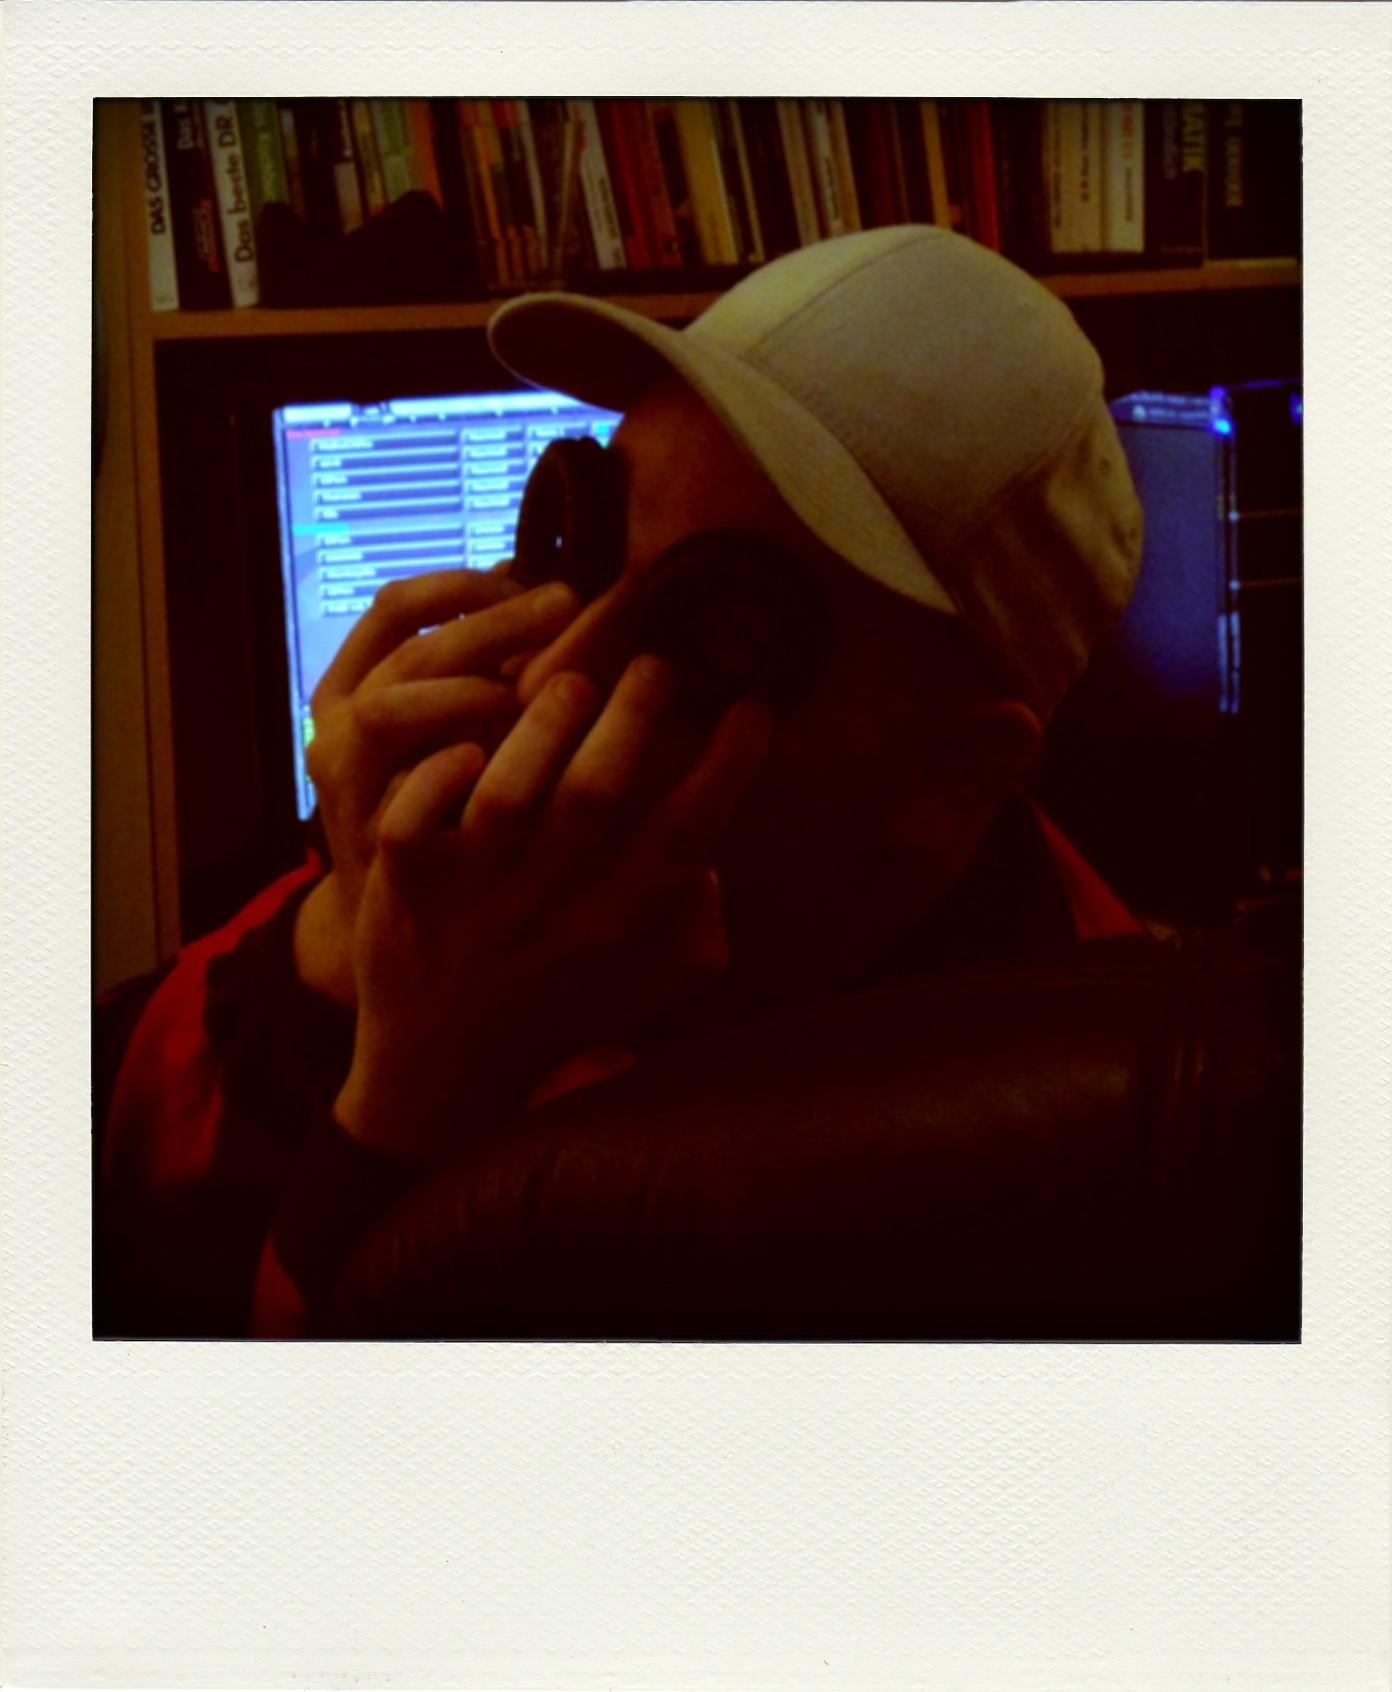 LAG_Basti_Polaroid